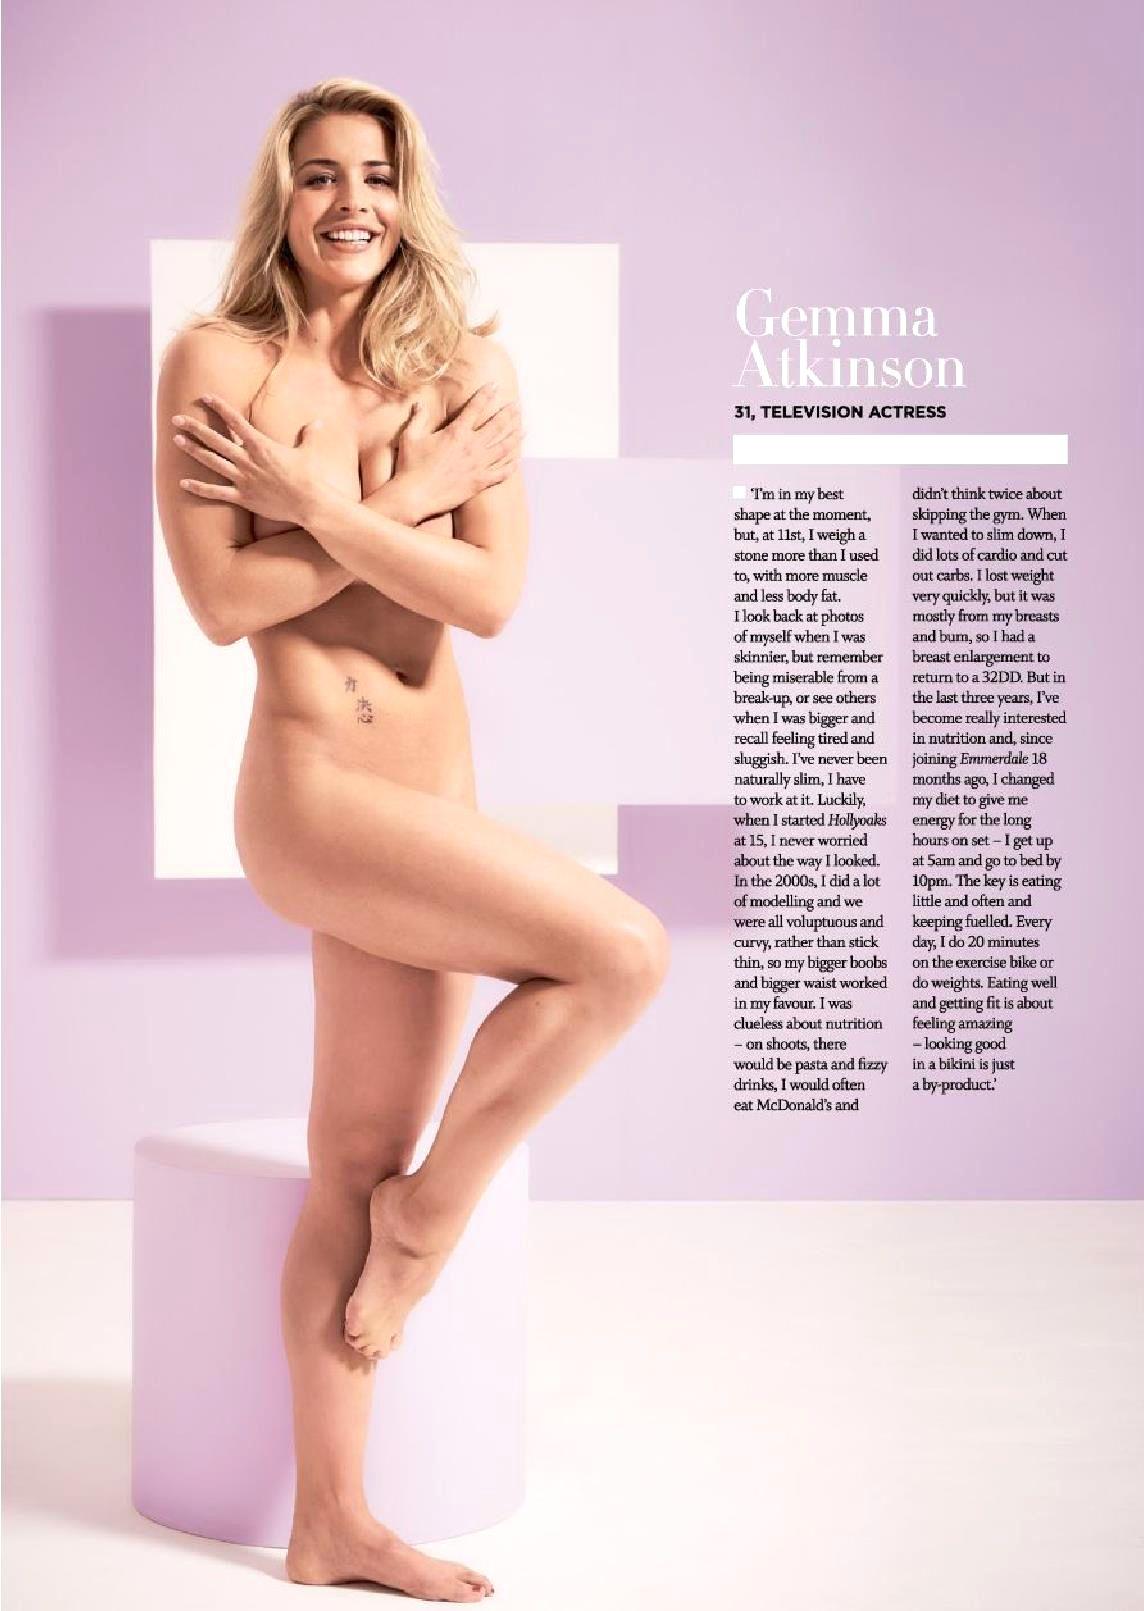 Gemma-Atkinson-Naked-1